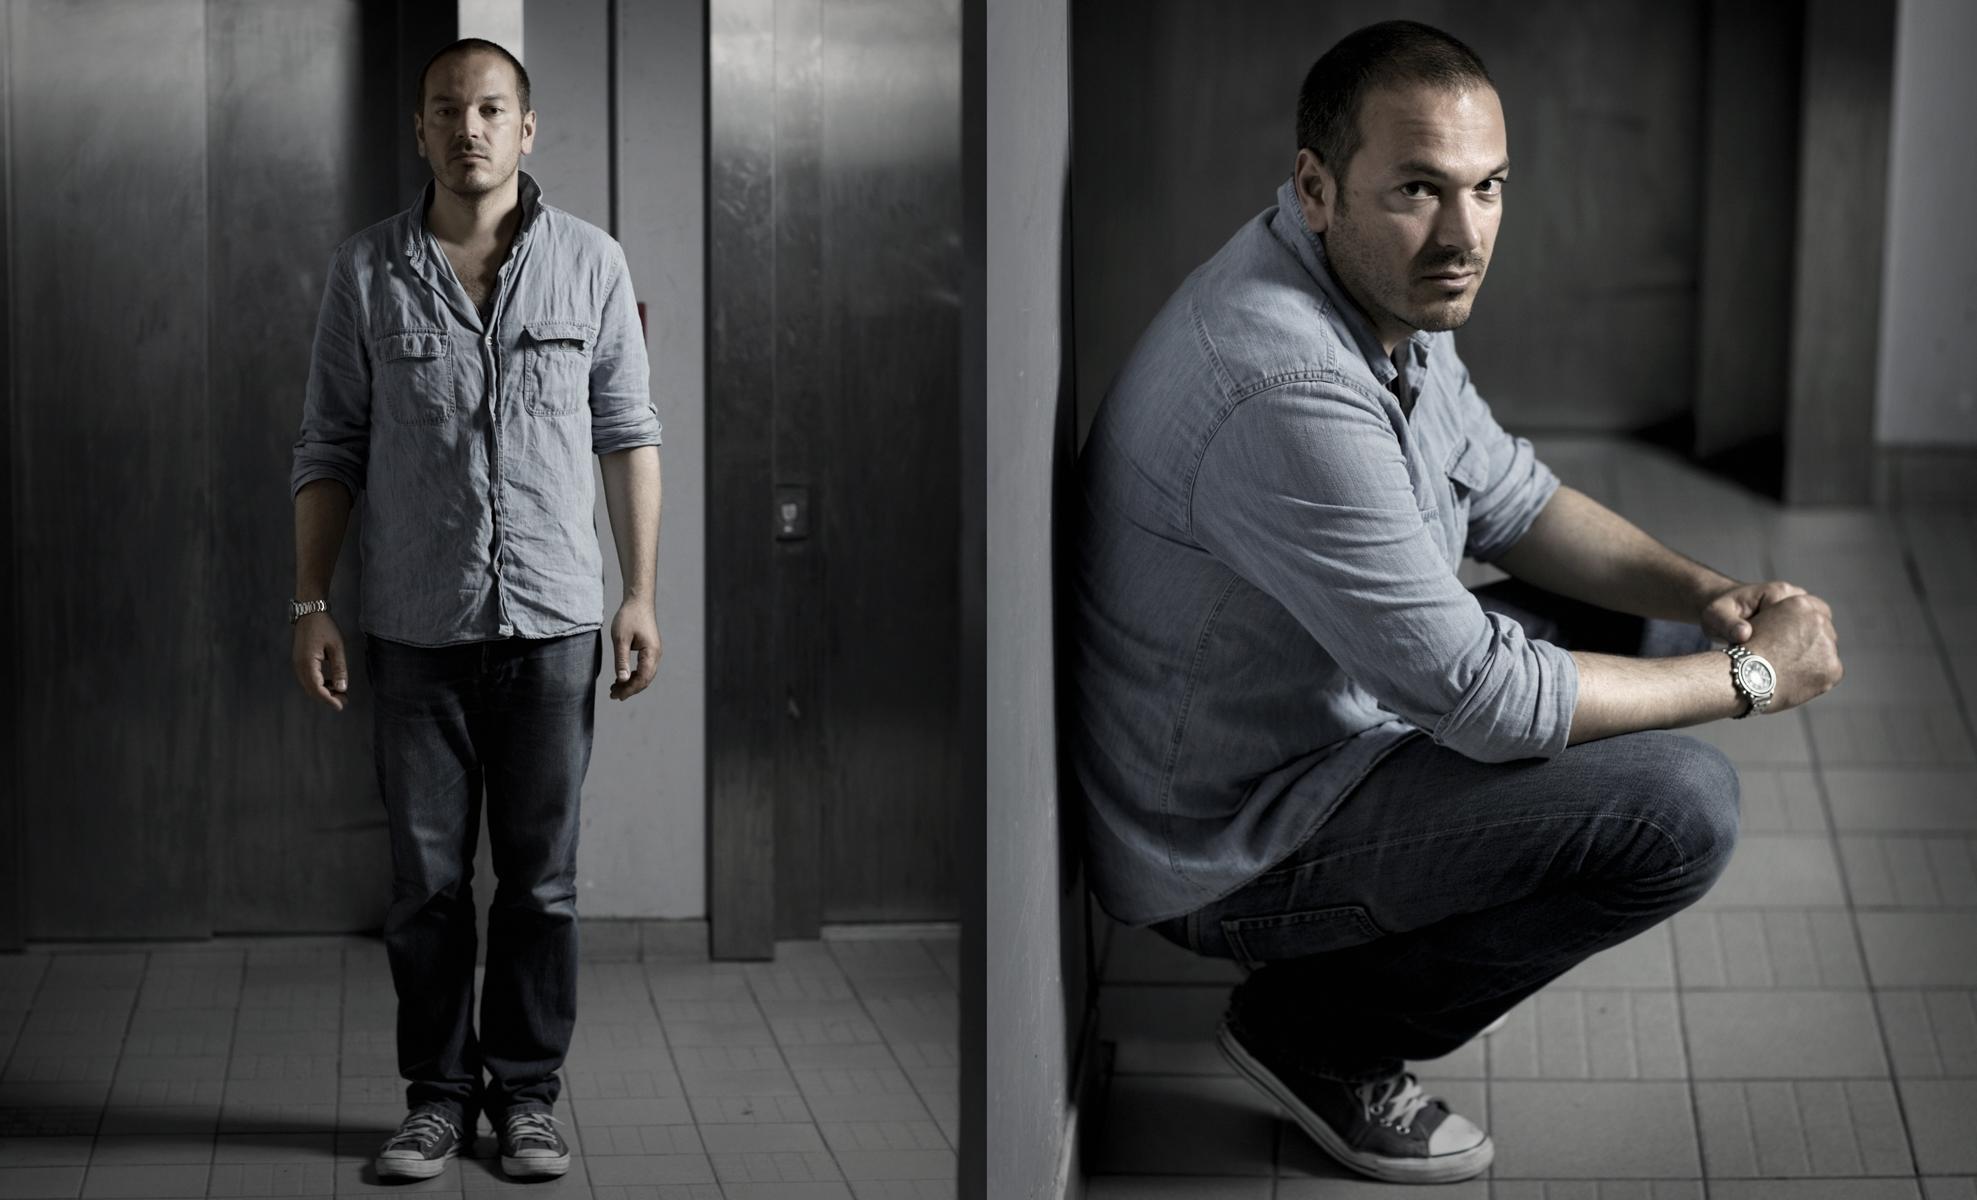 jean stephane bron, paris 2010